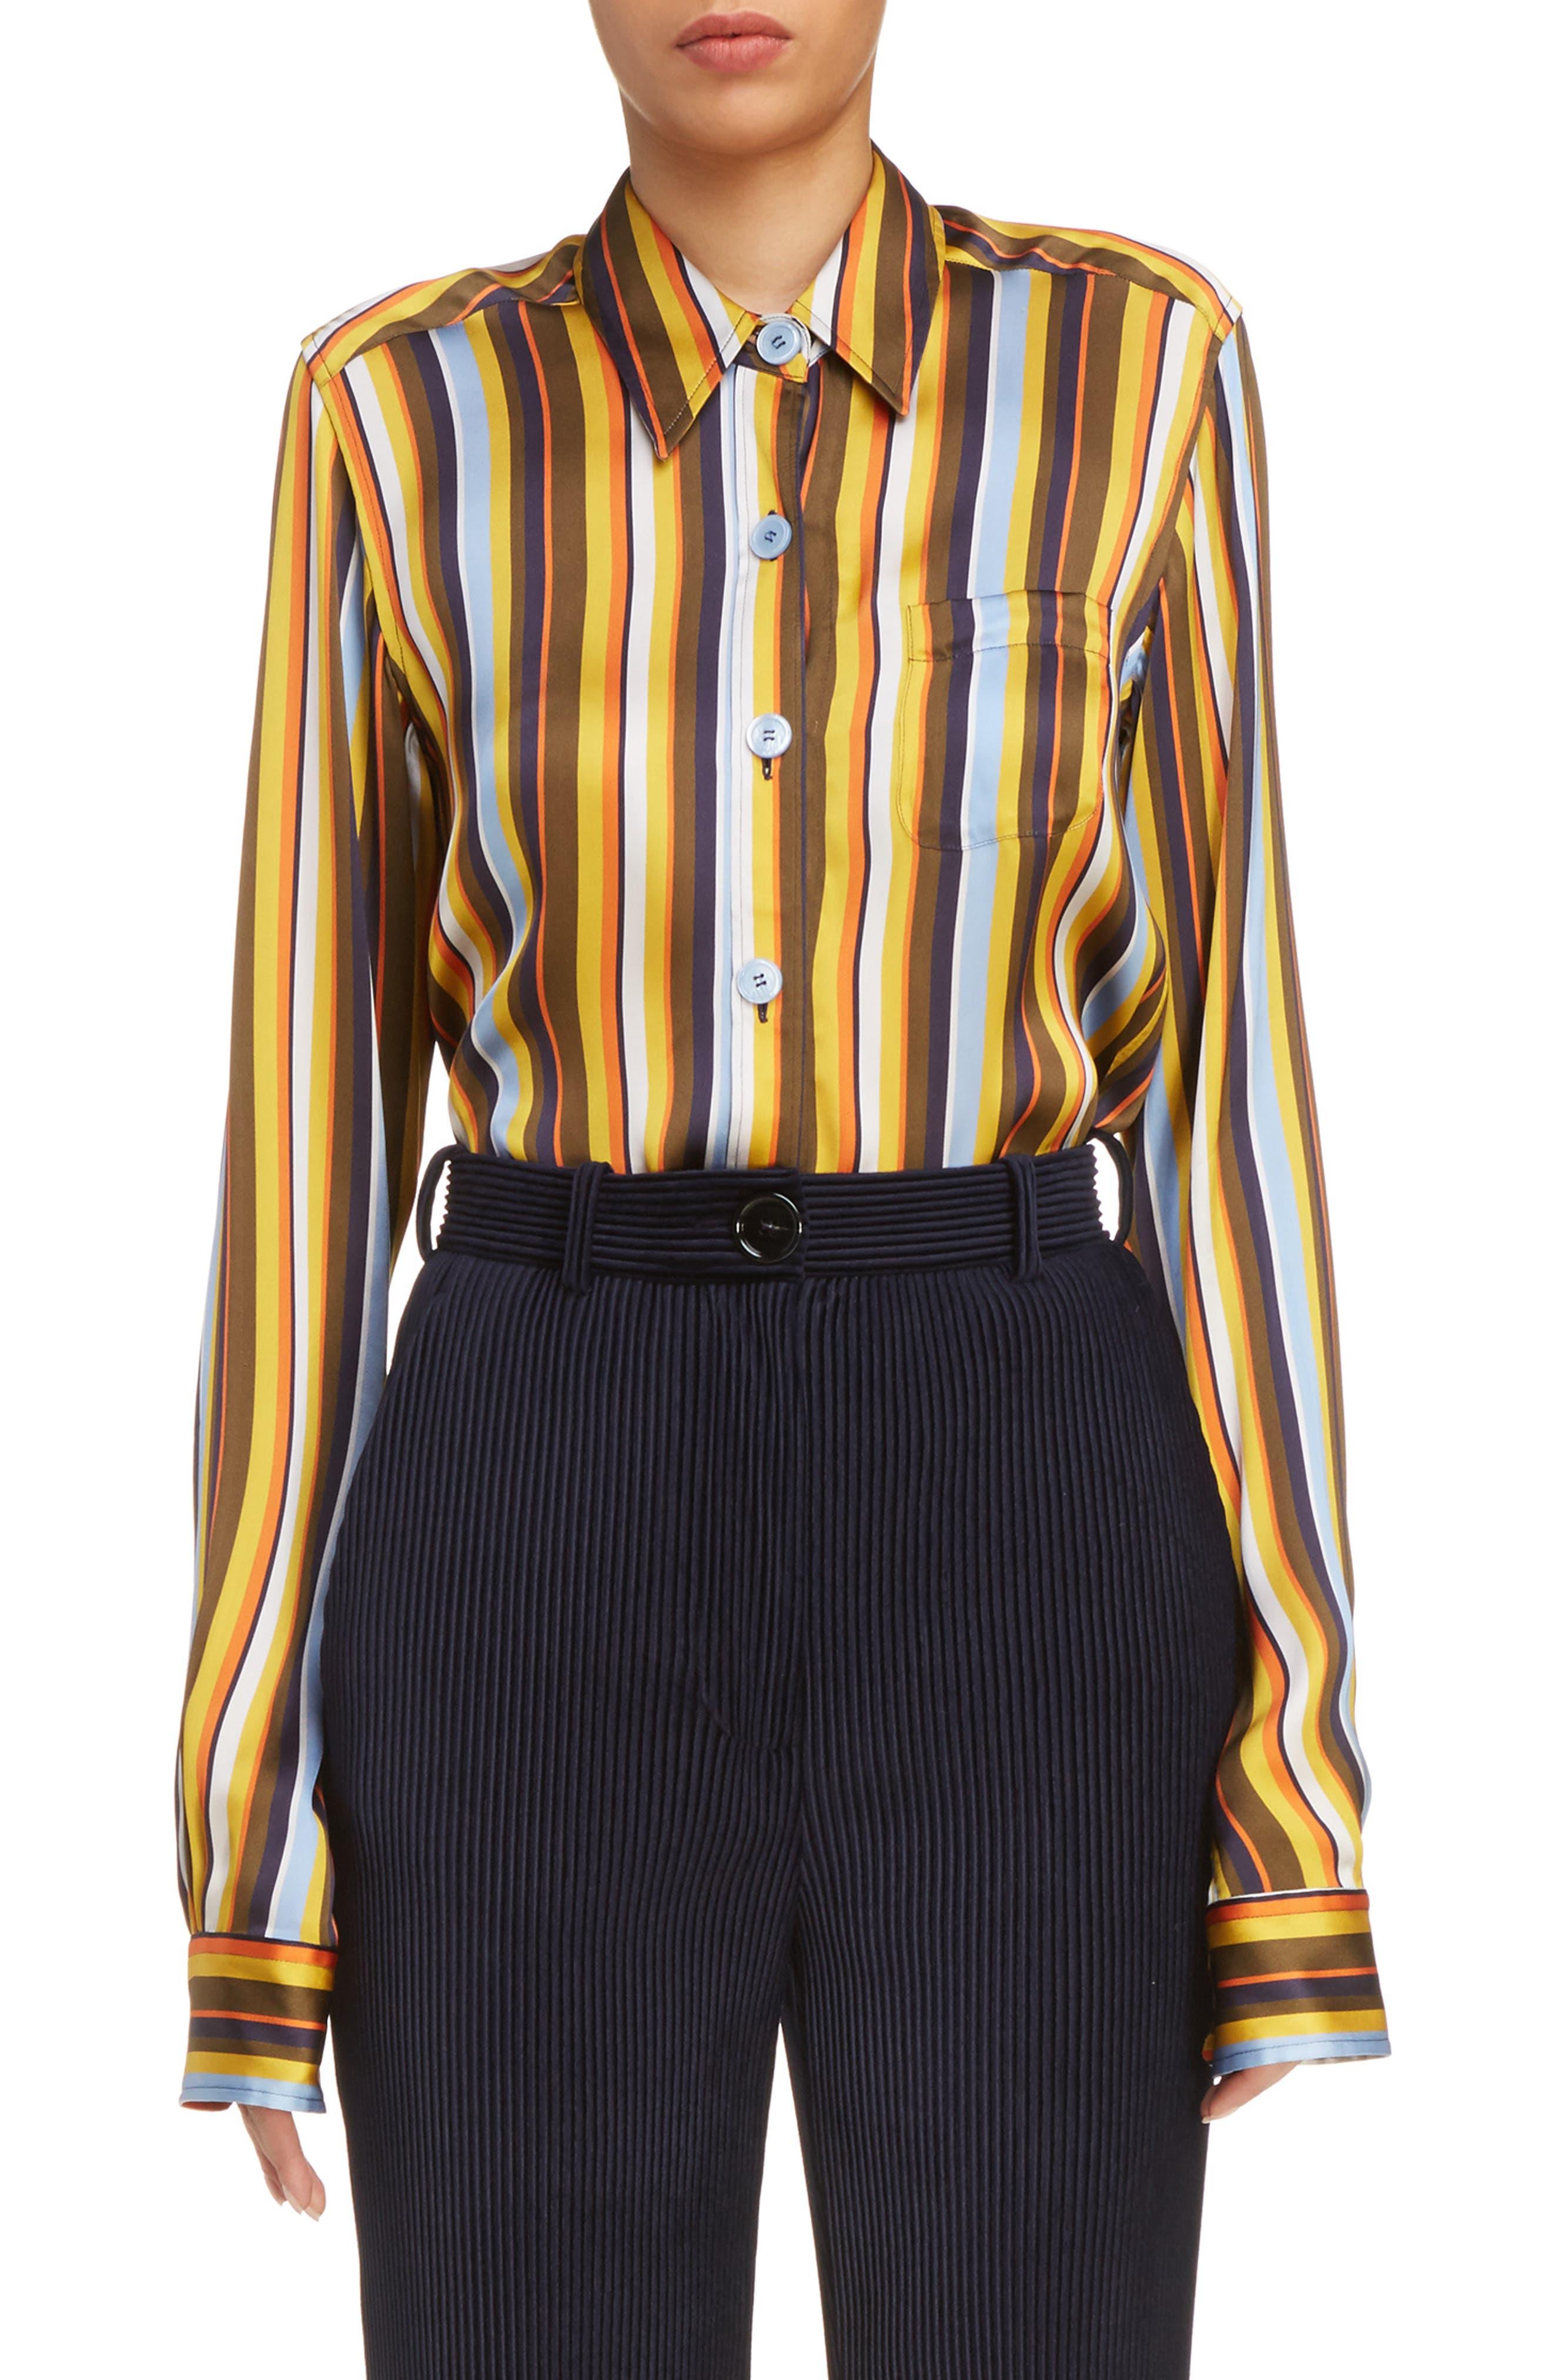 Buse Multistripe Blouse,                         Main,                         color, Multi Stripe Brown